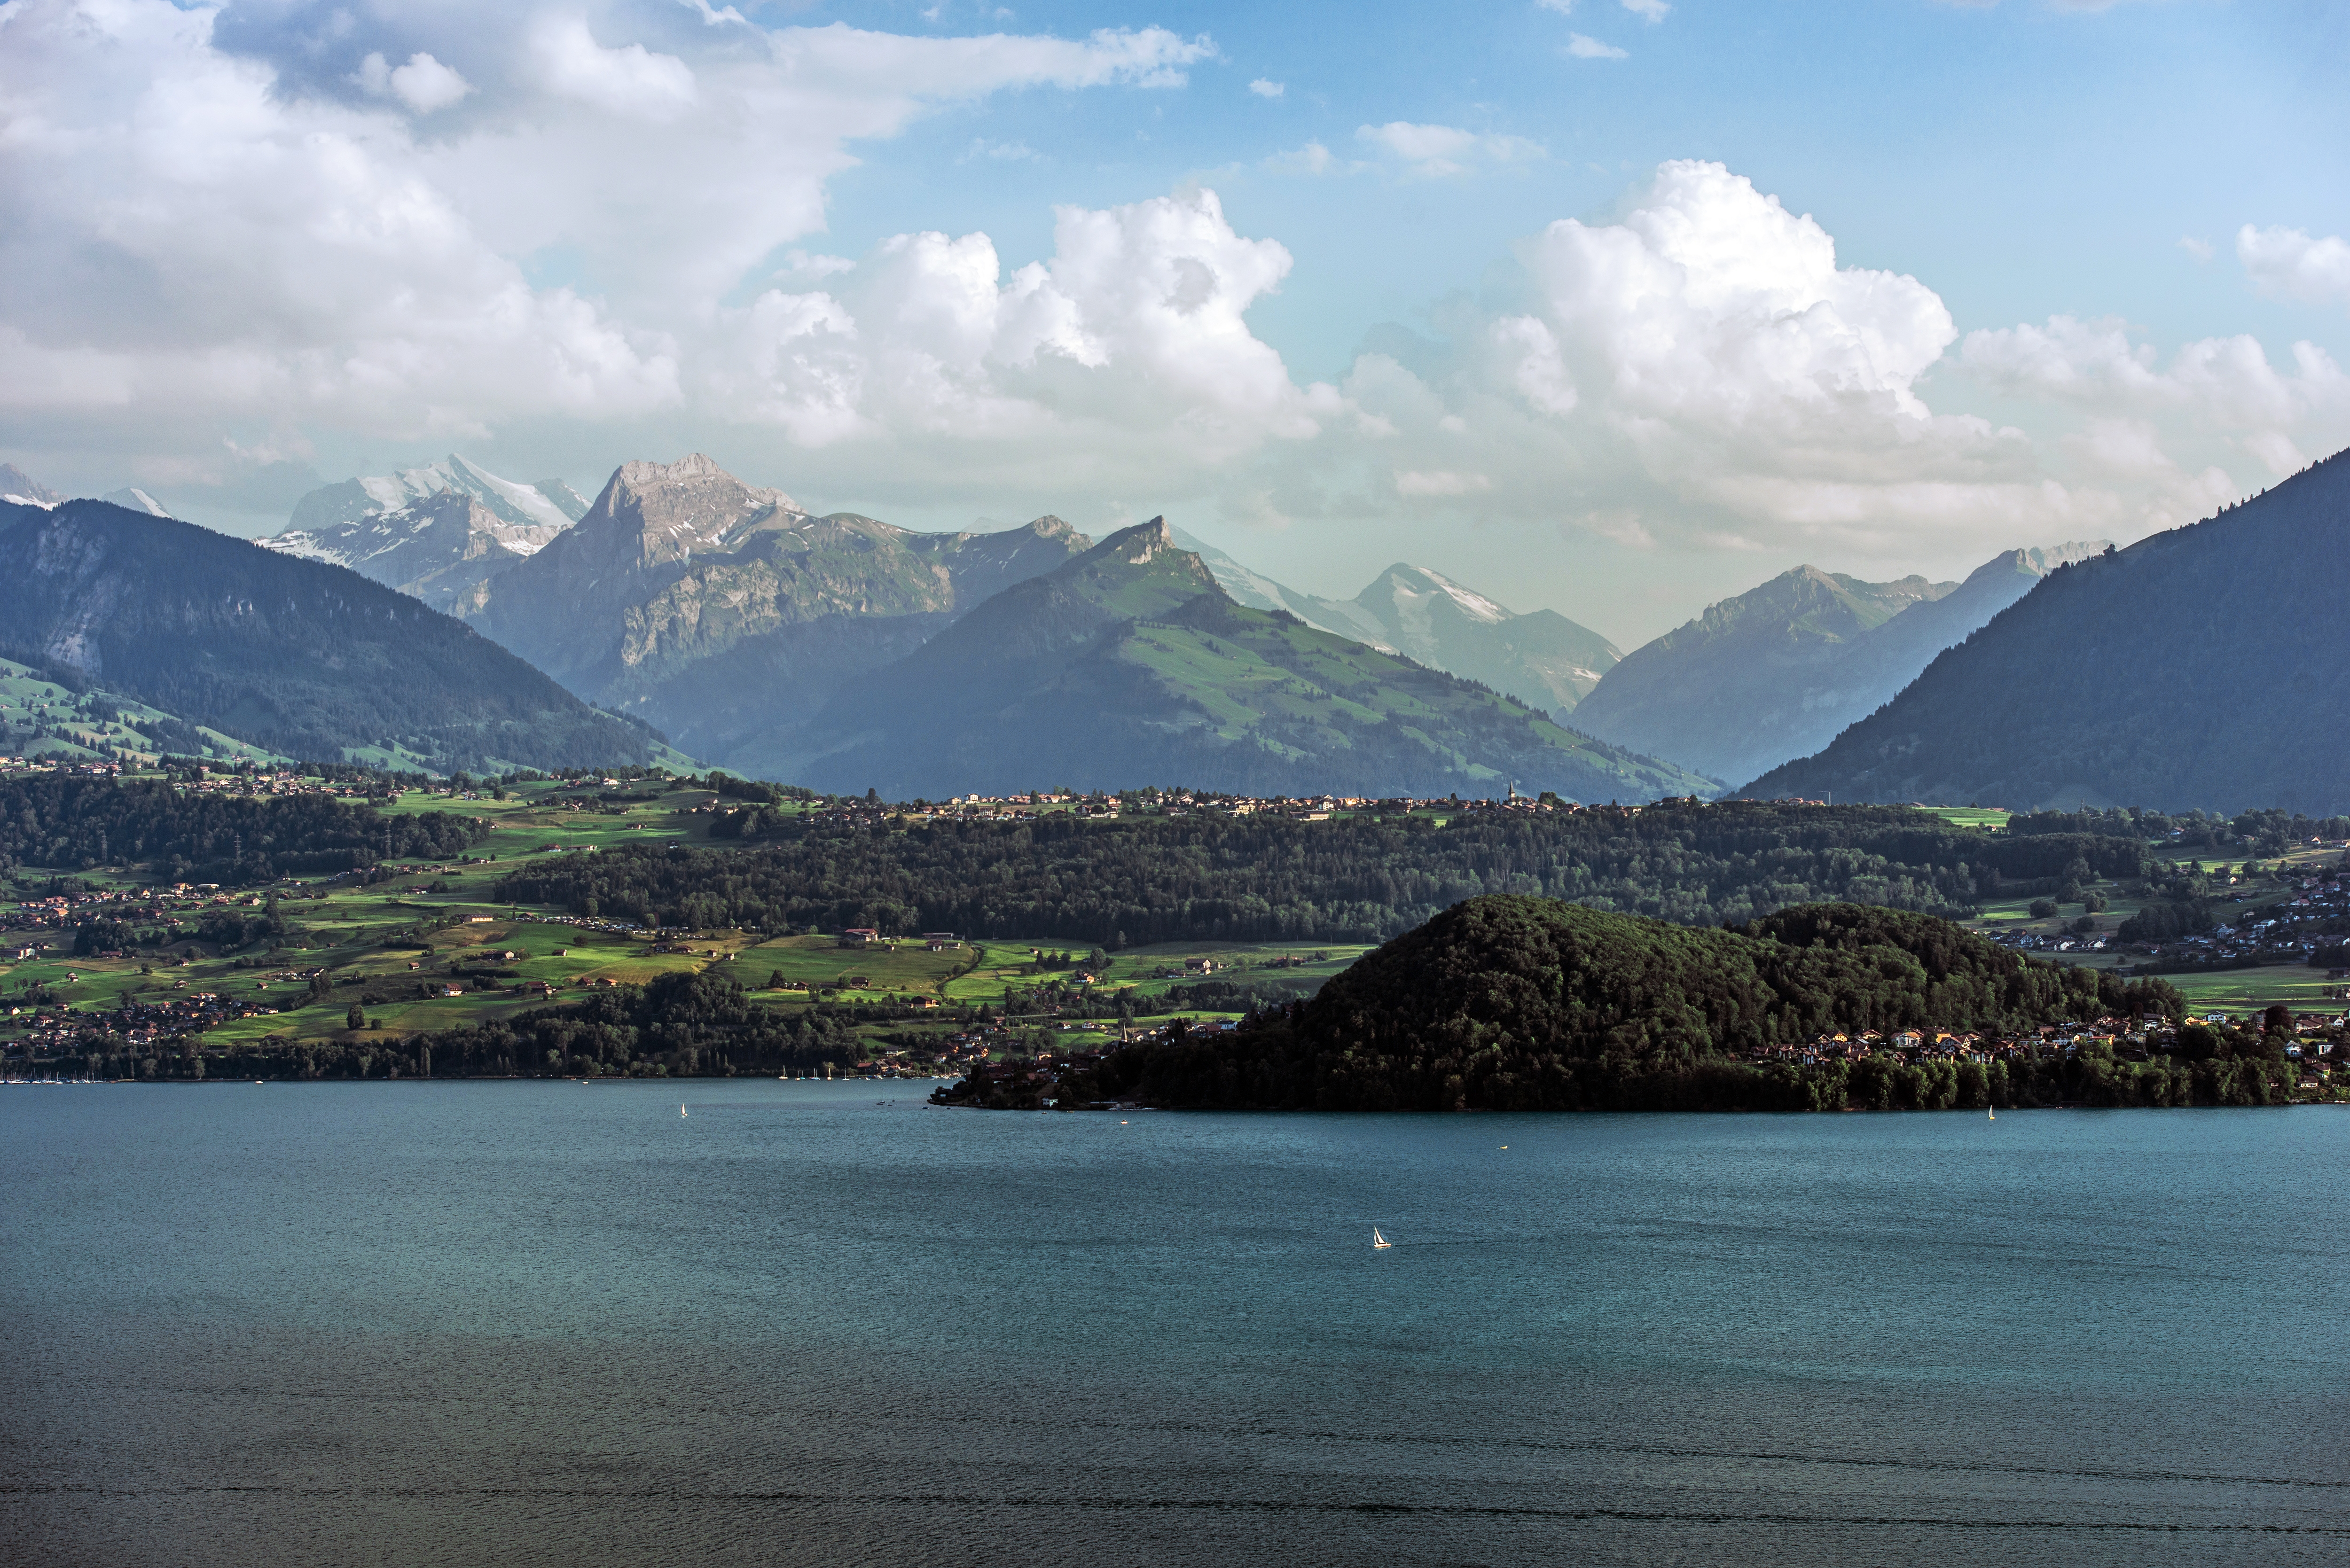 lake-thun-in-switzerland-PG4PKGK